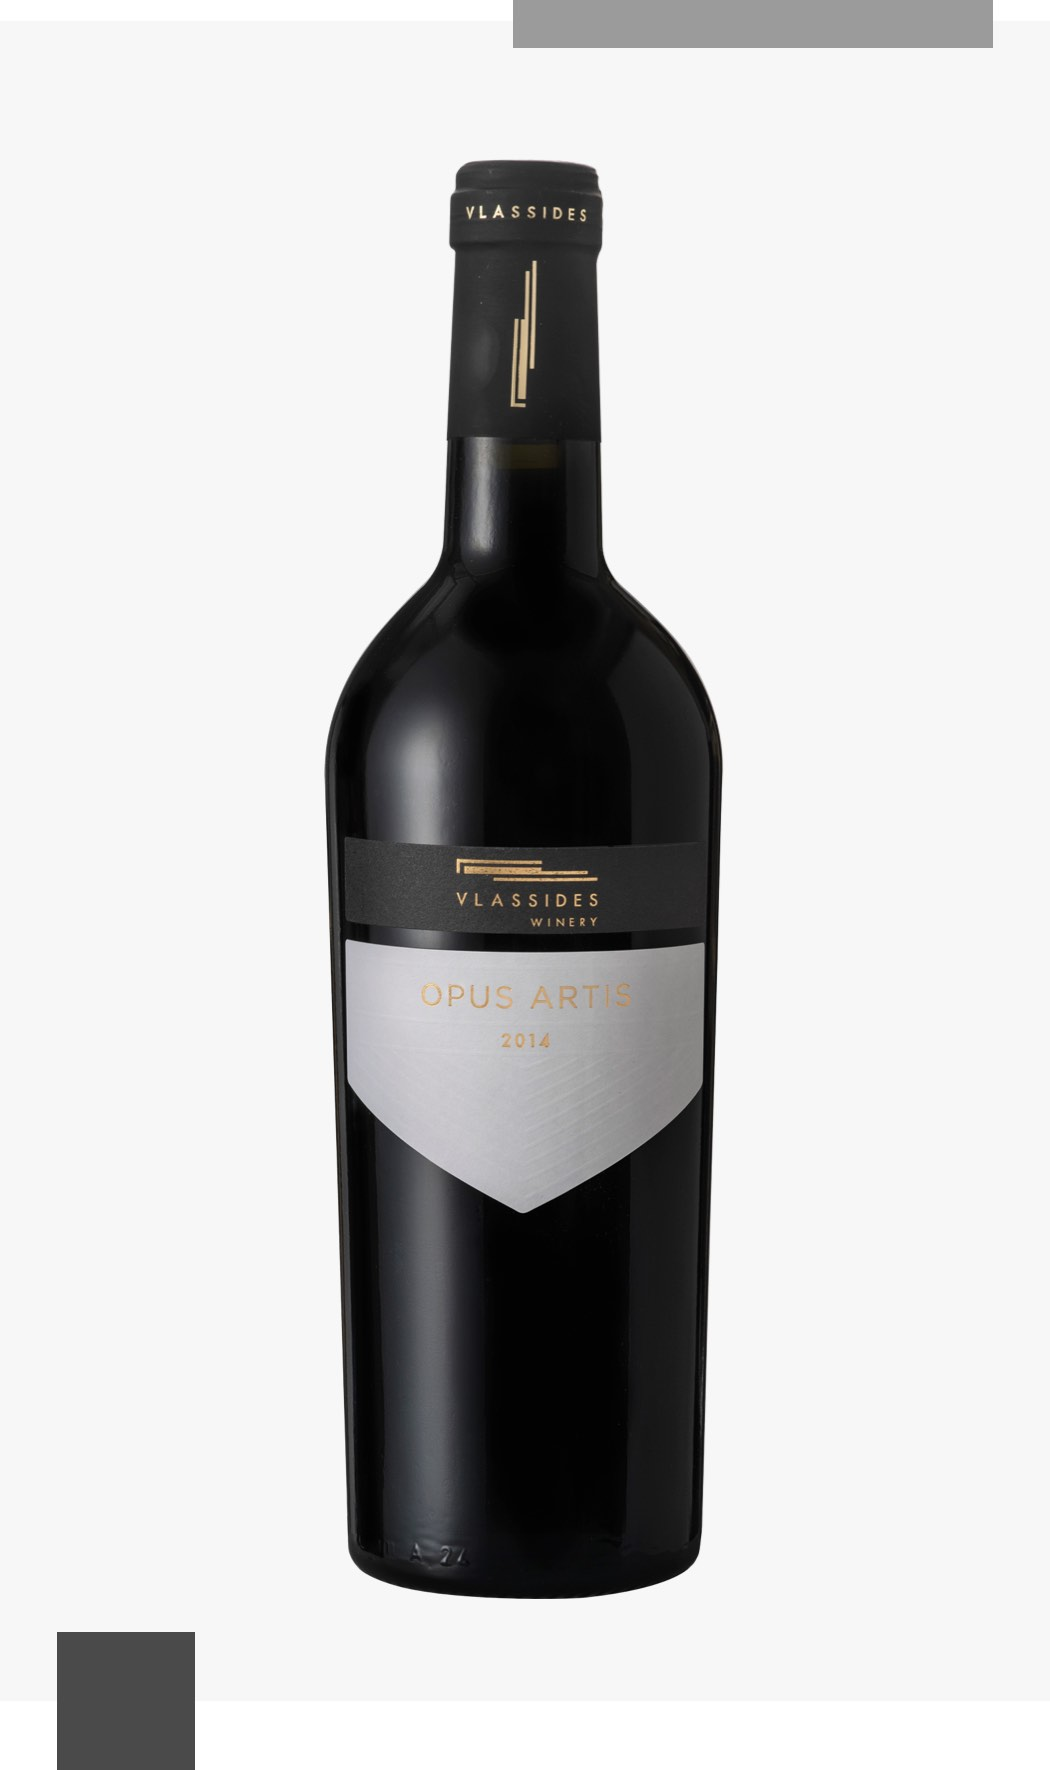 vlassides winery cyprus opus artis